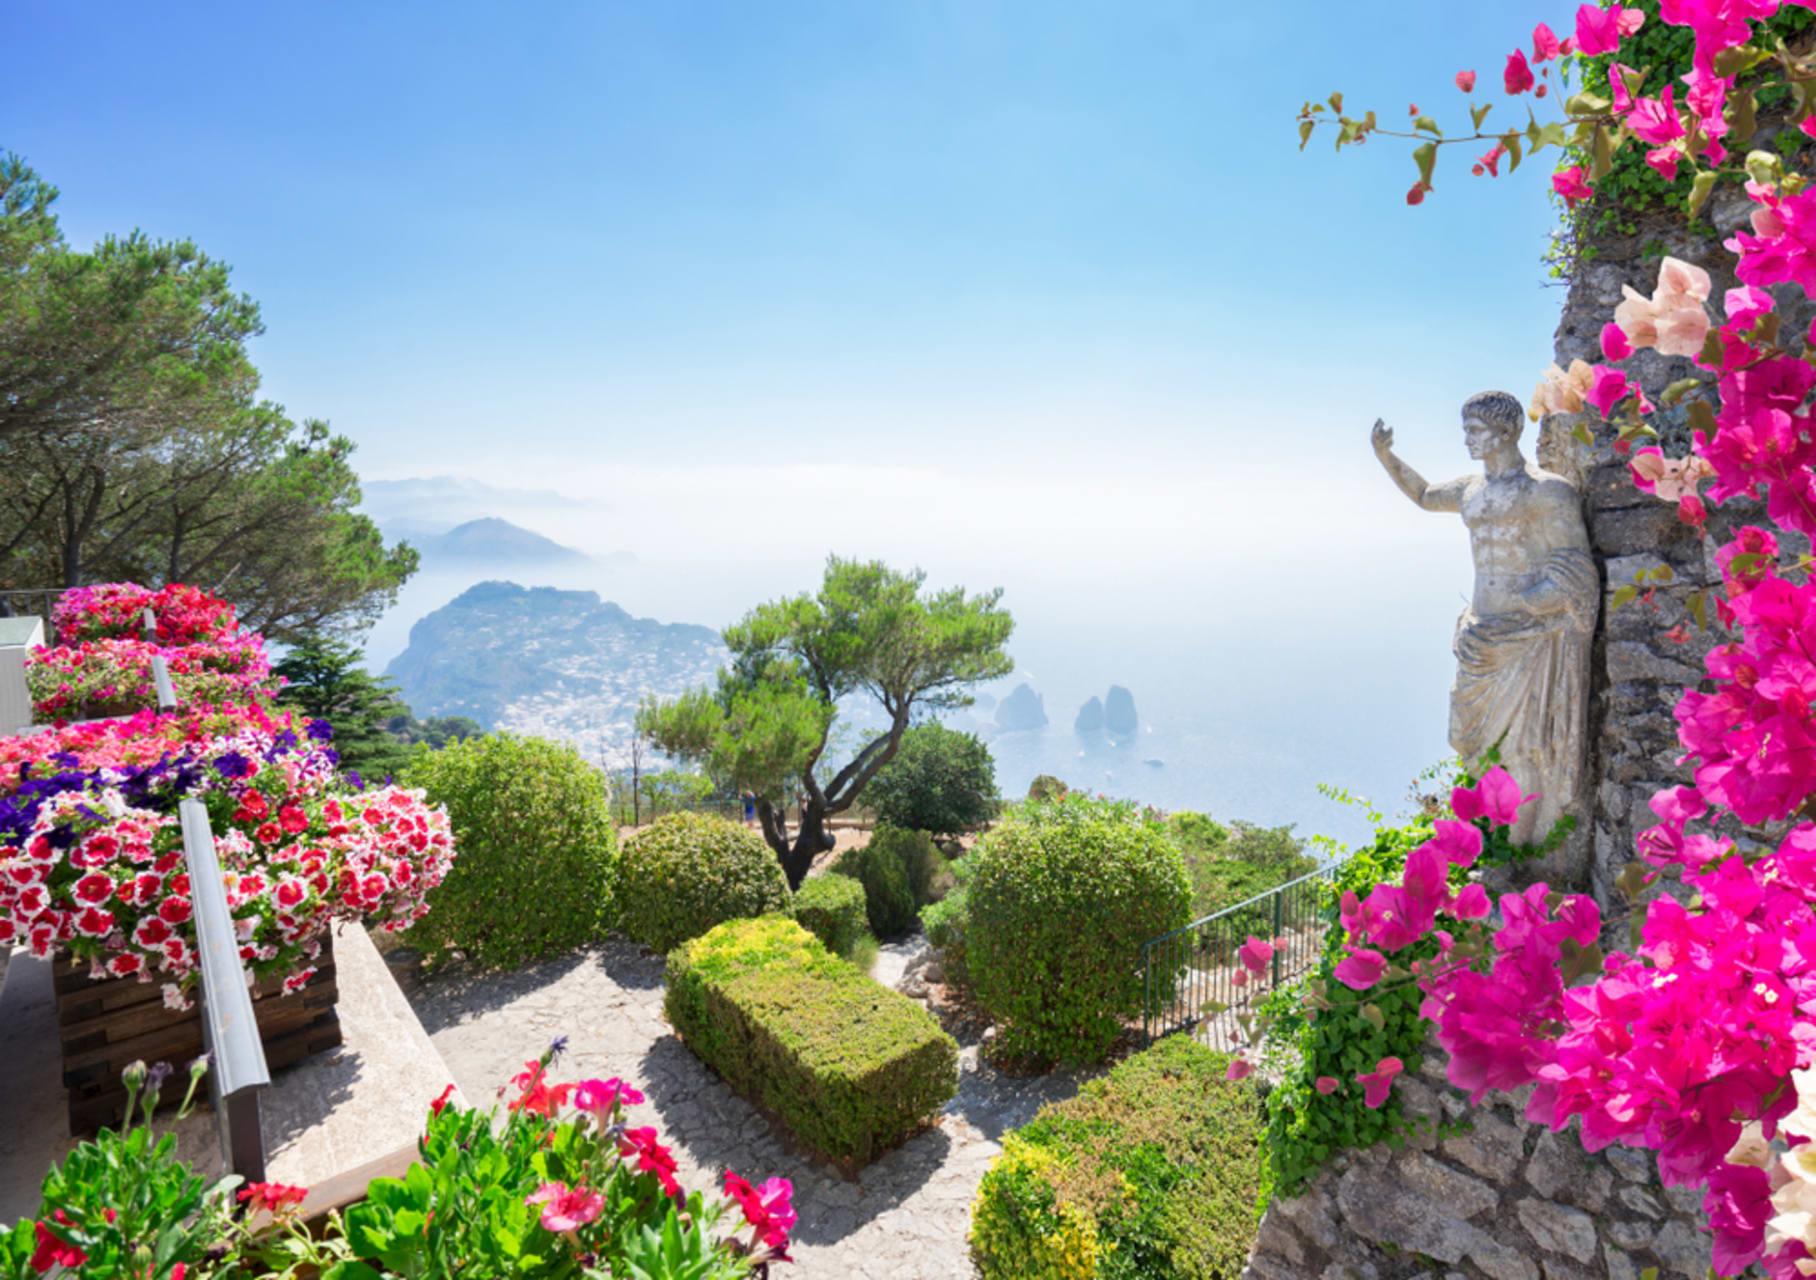 Capri Island - Anacapri: A Must To Discover